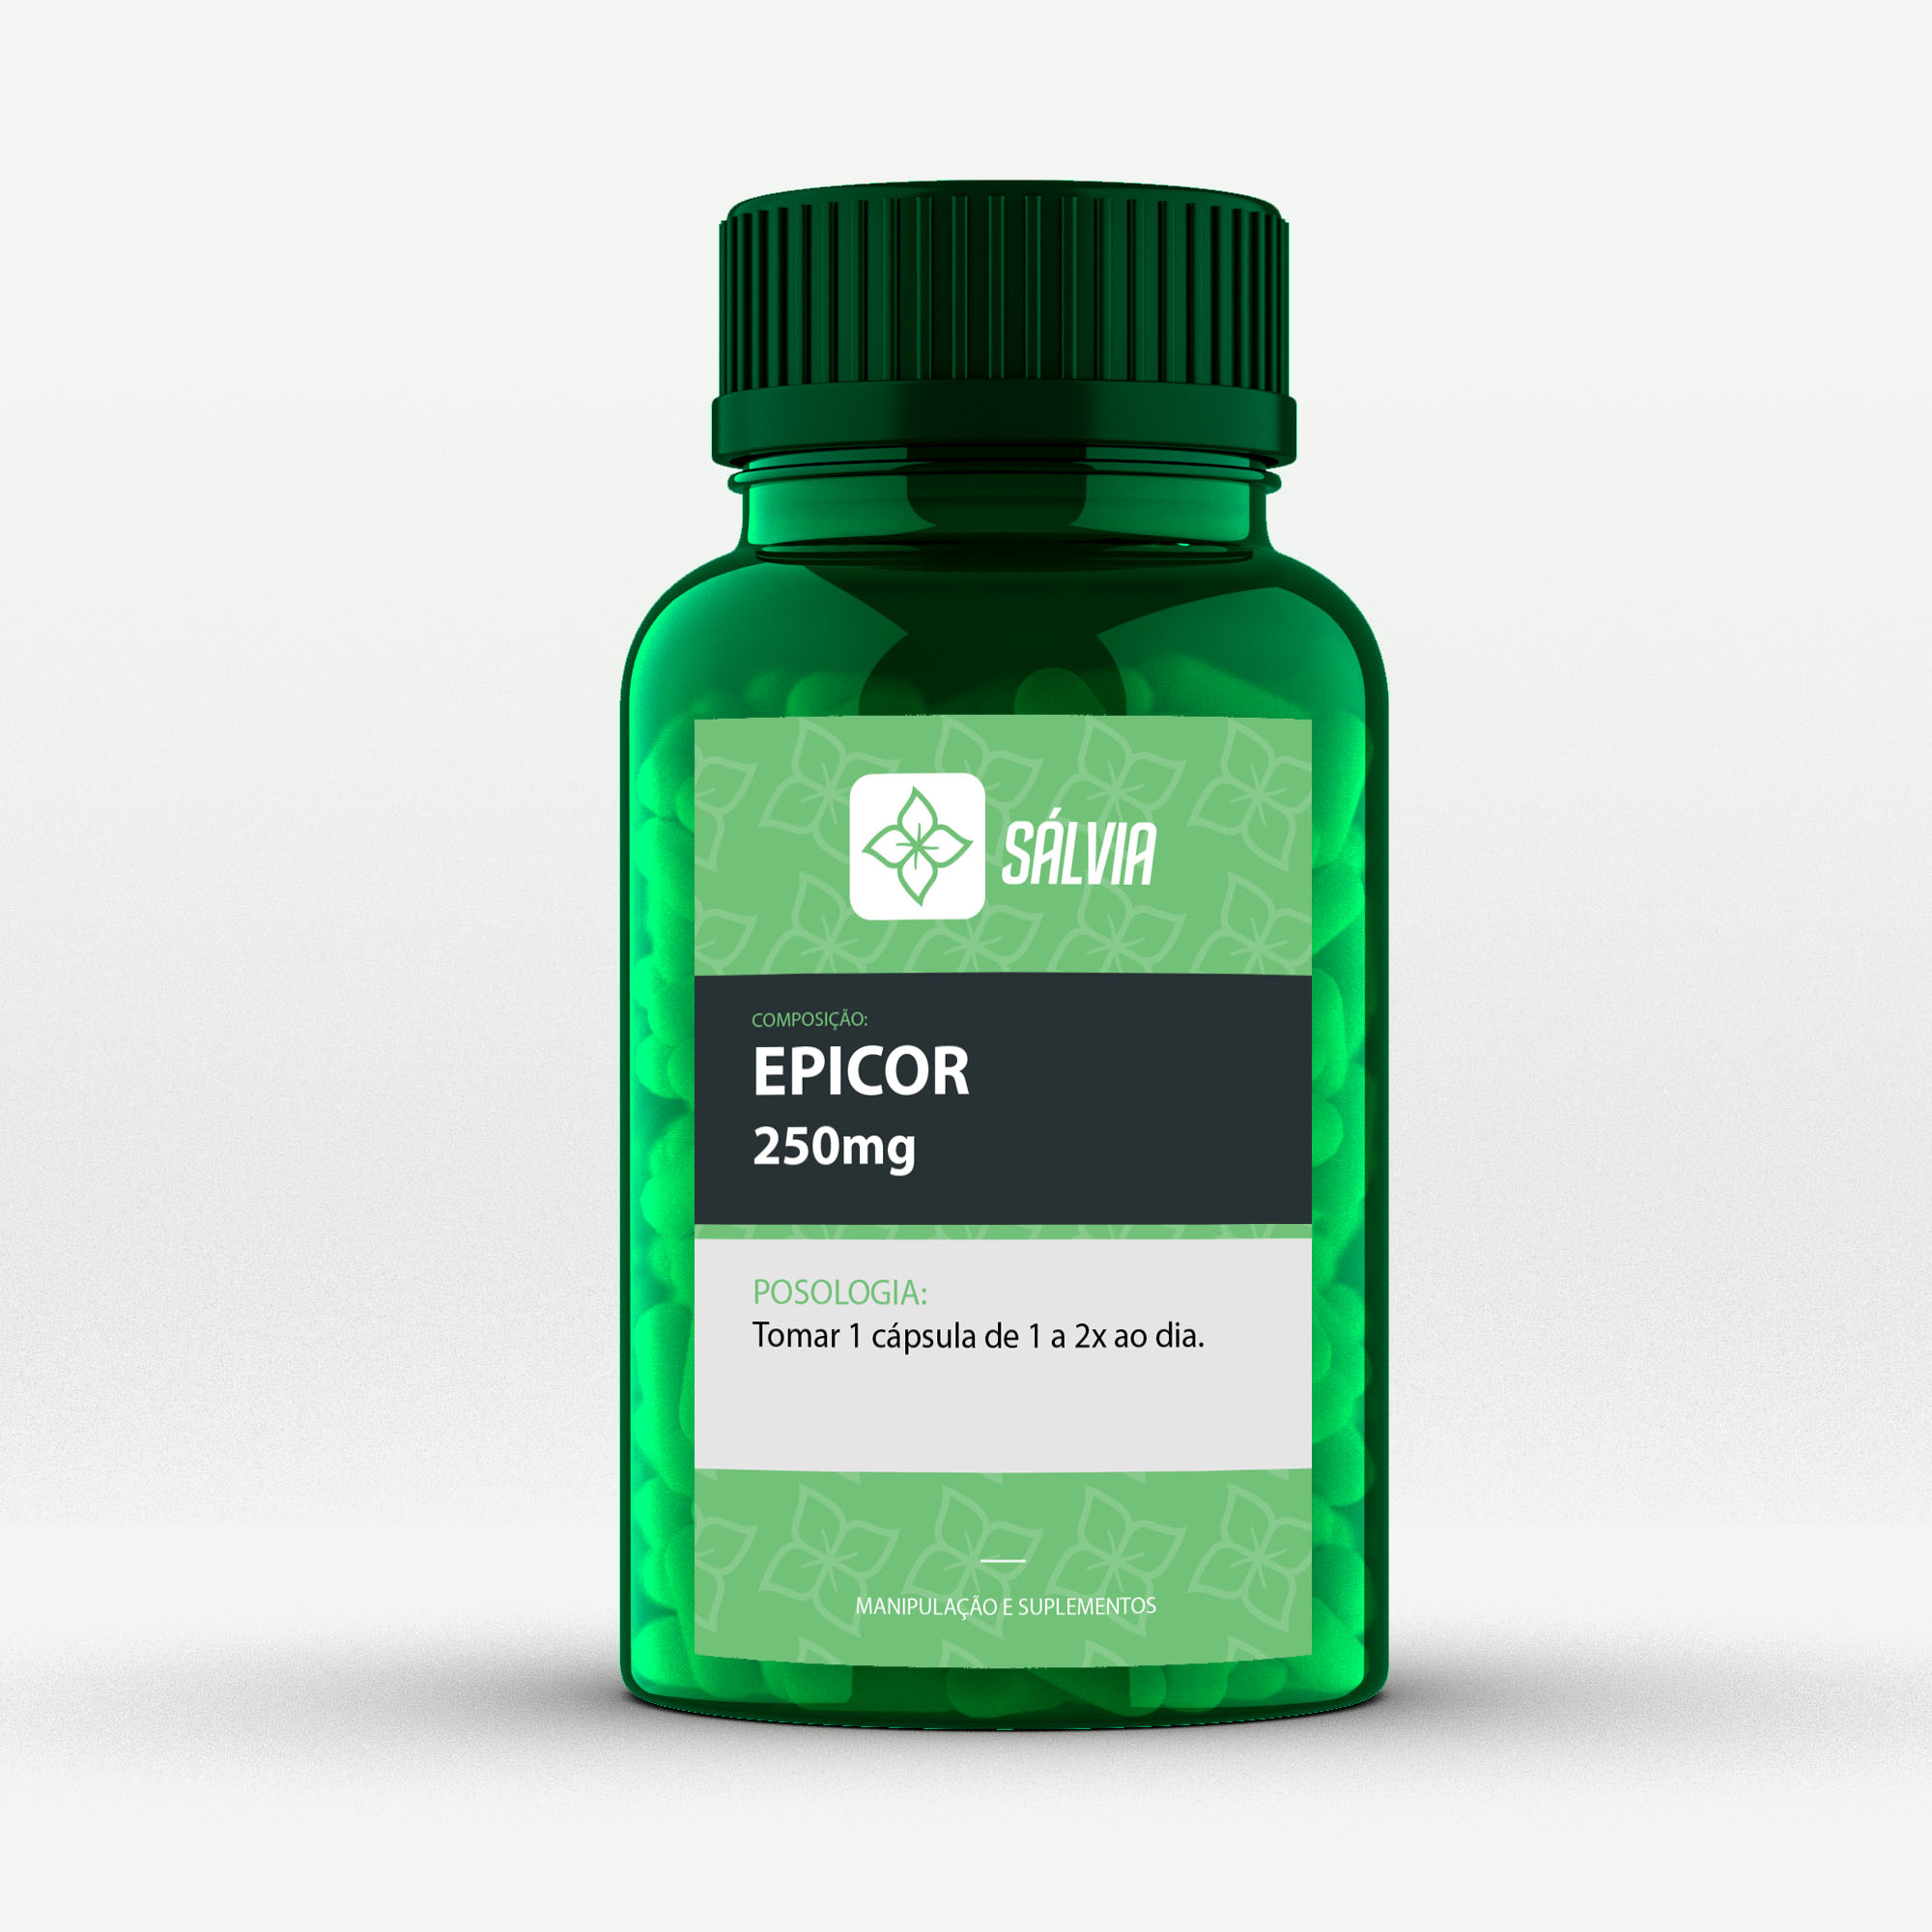 EPICOR 250mg - Cápsulas